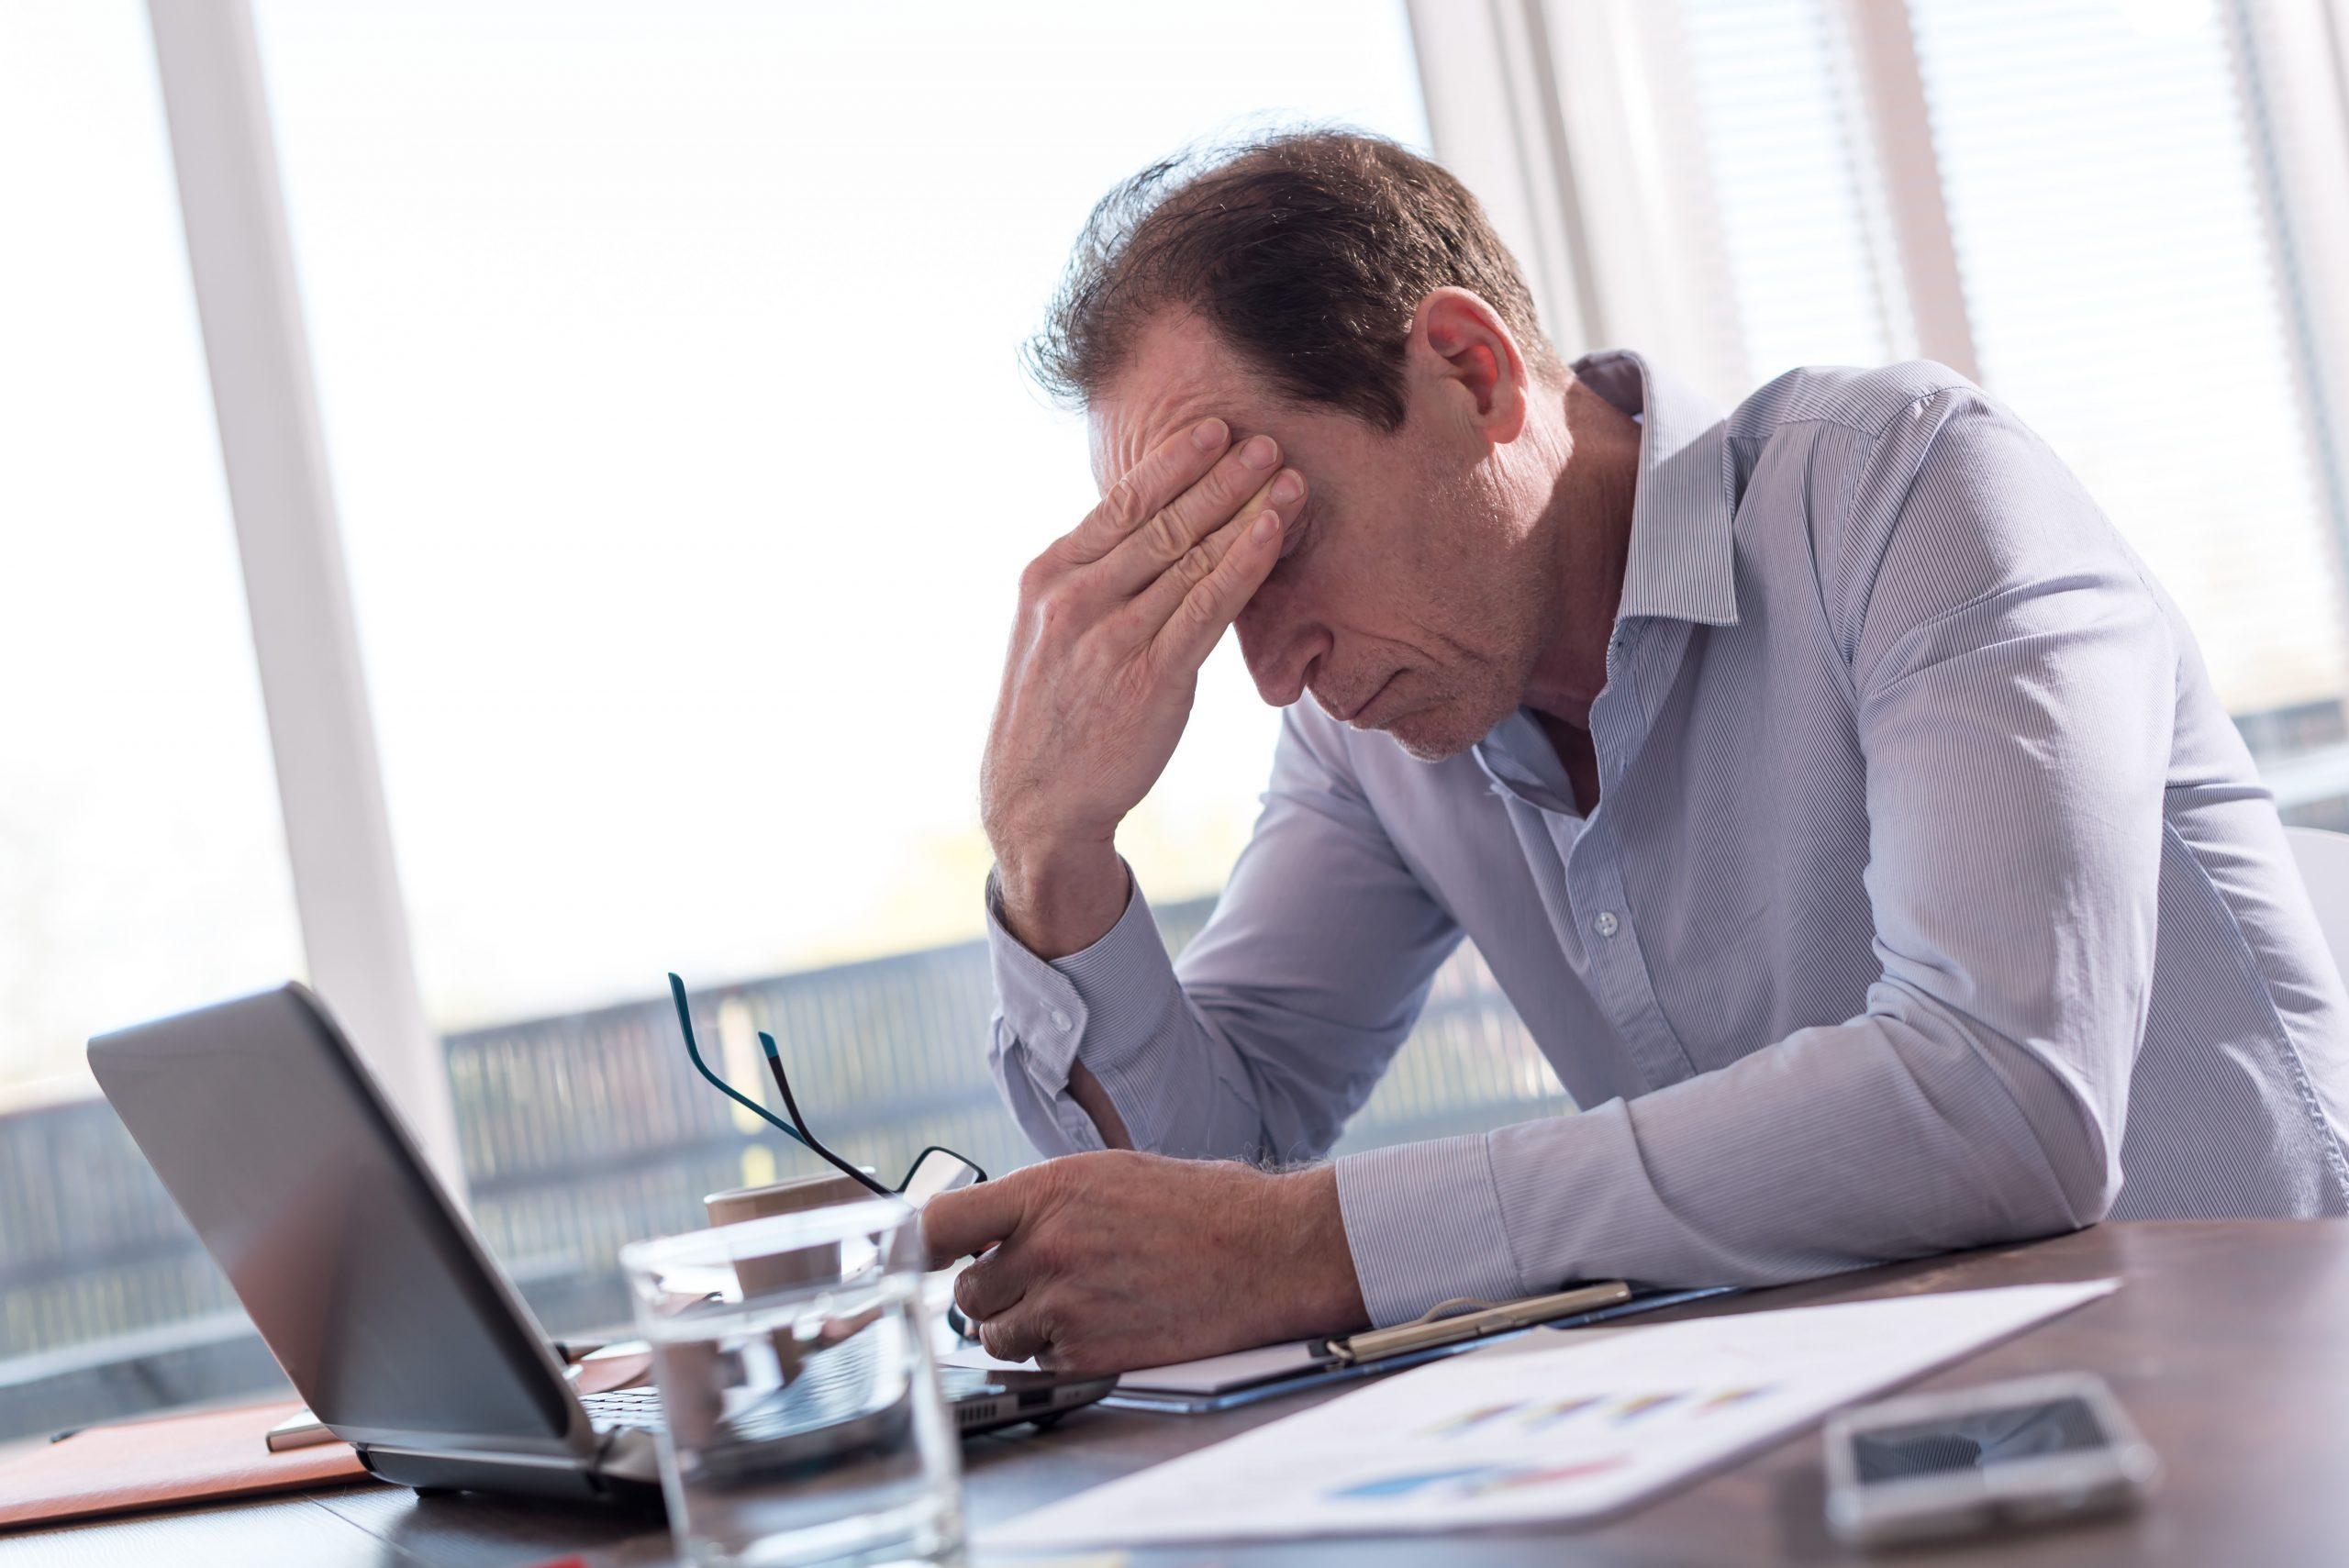 exhausted man staring at laptop